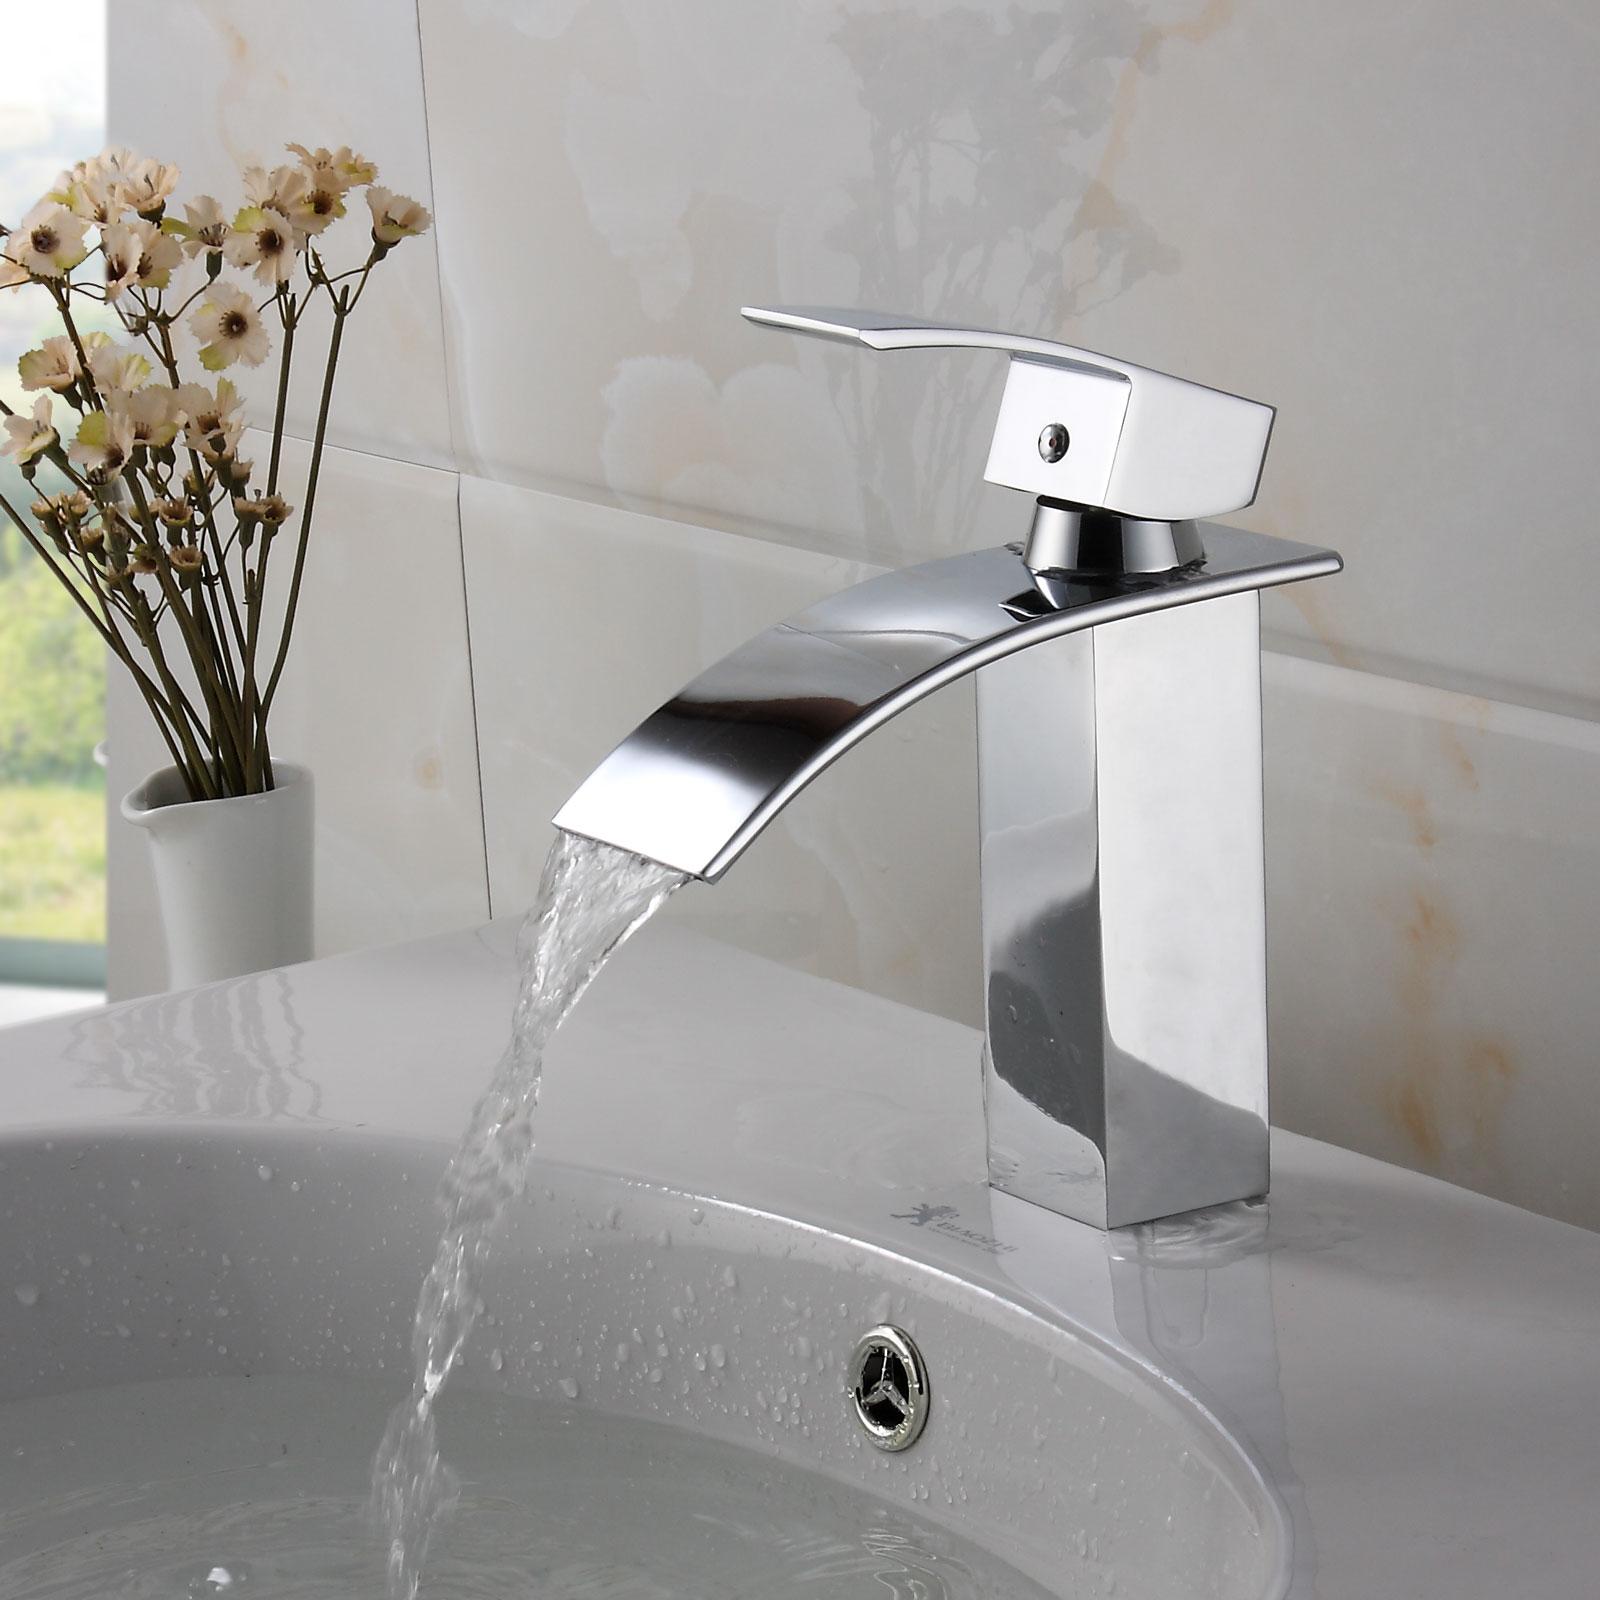 ELITE Modern Bathroom Sink Waterfall Faucet Chrome Finish 8803C Bathroom  sinks, stone sink,kitchen sink,Stainless Steelsink, bathroom, sink, glass  sink,